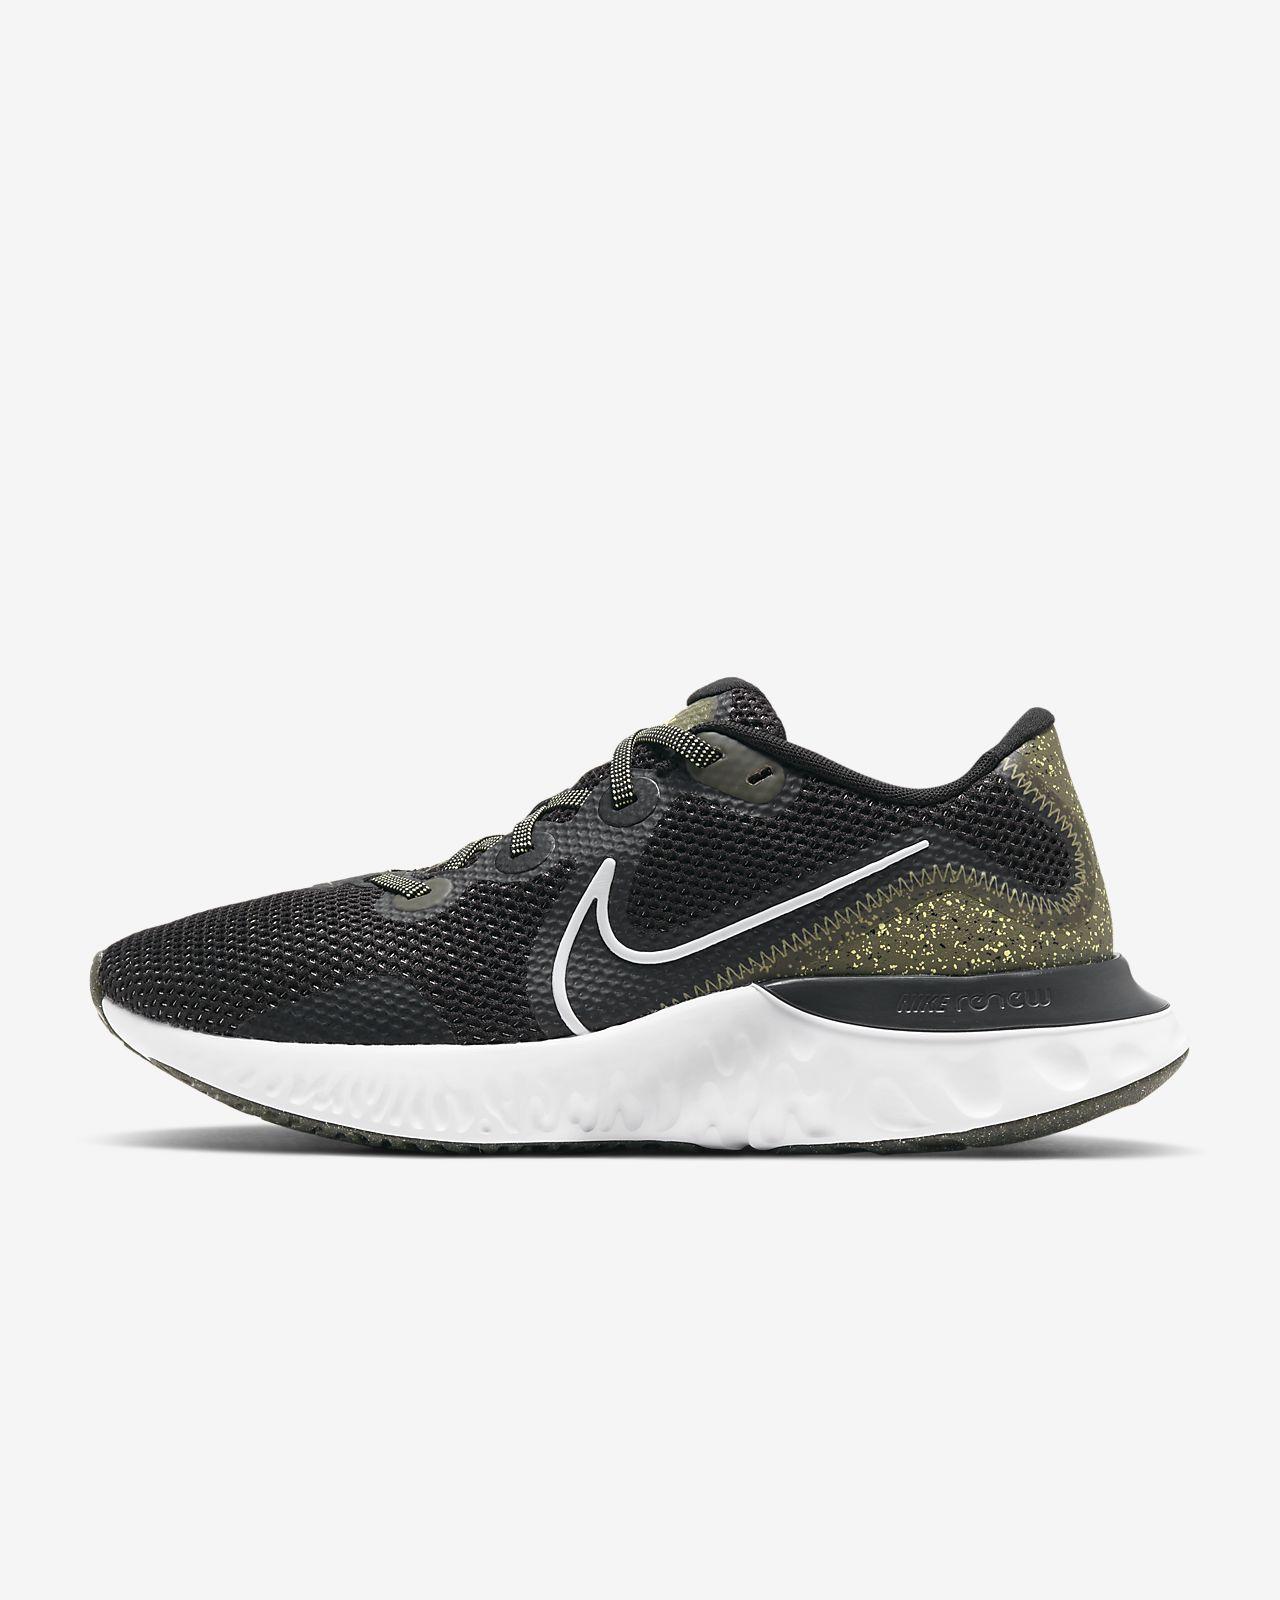 Nike Renew Run Special Edition Men's Running Shoe